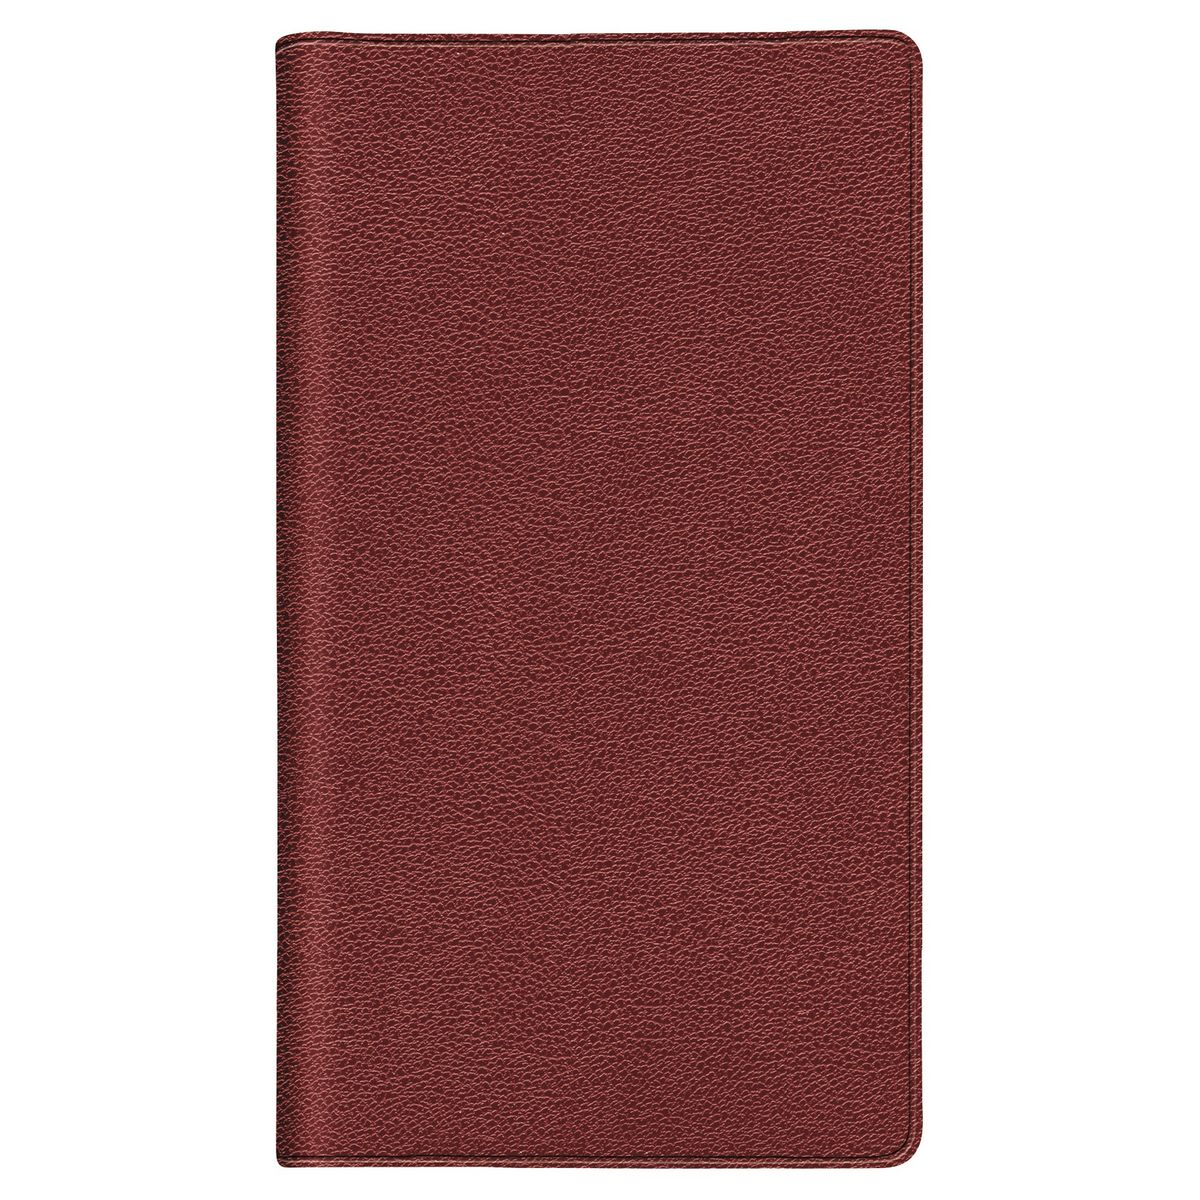 Agenda scolaire semainier 128 pages 9x16cm rouge 2019 2020